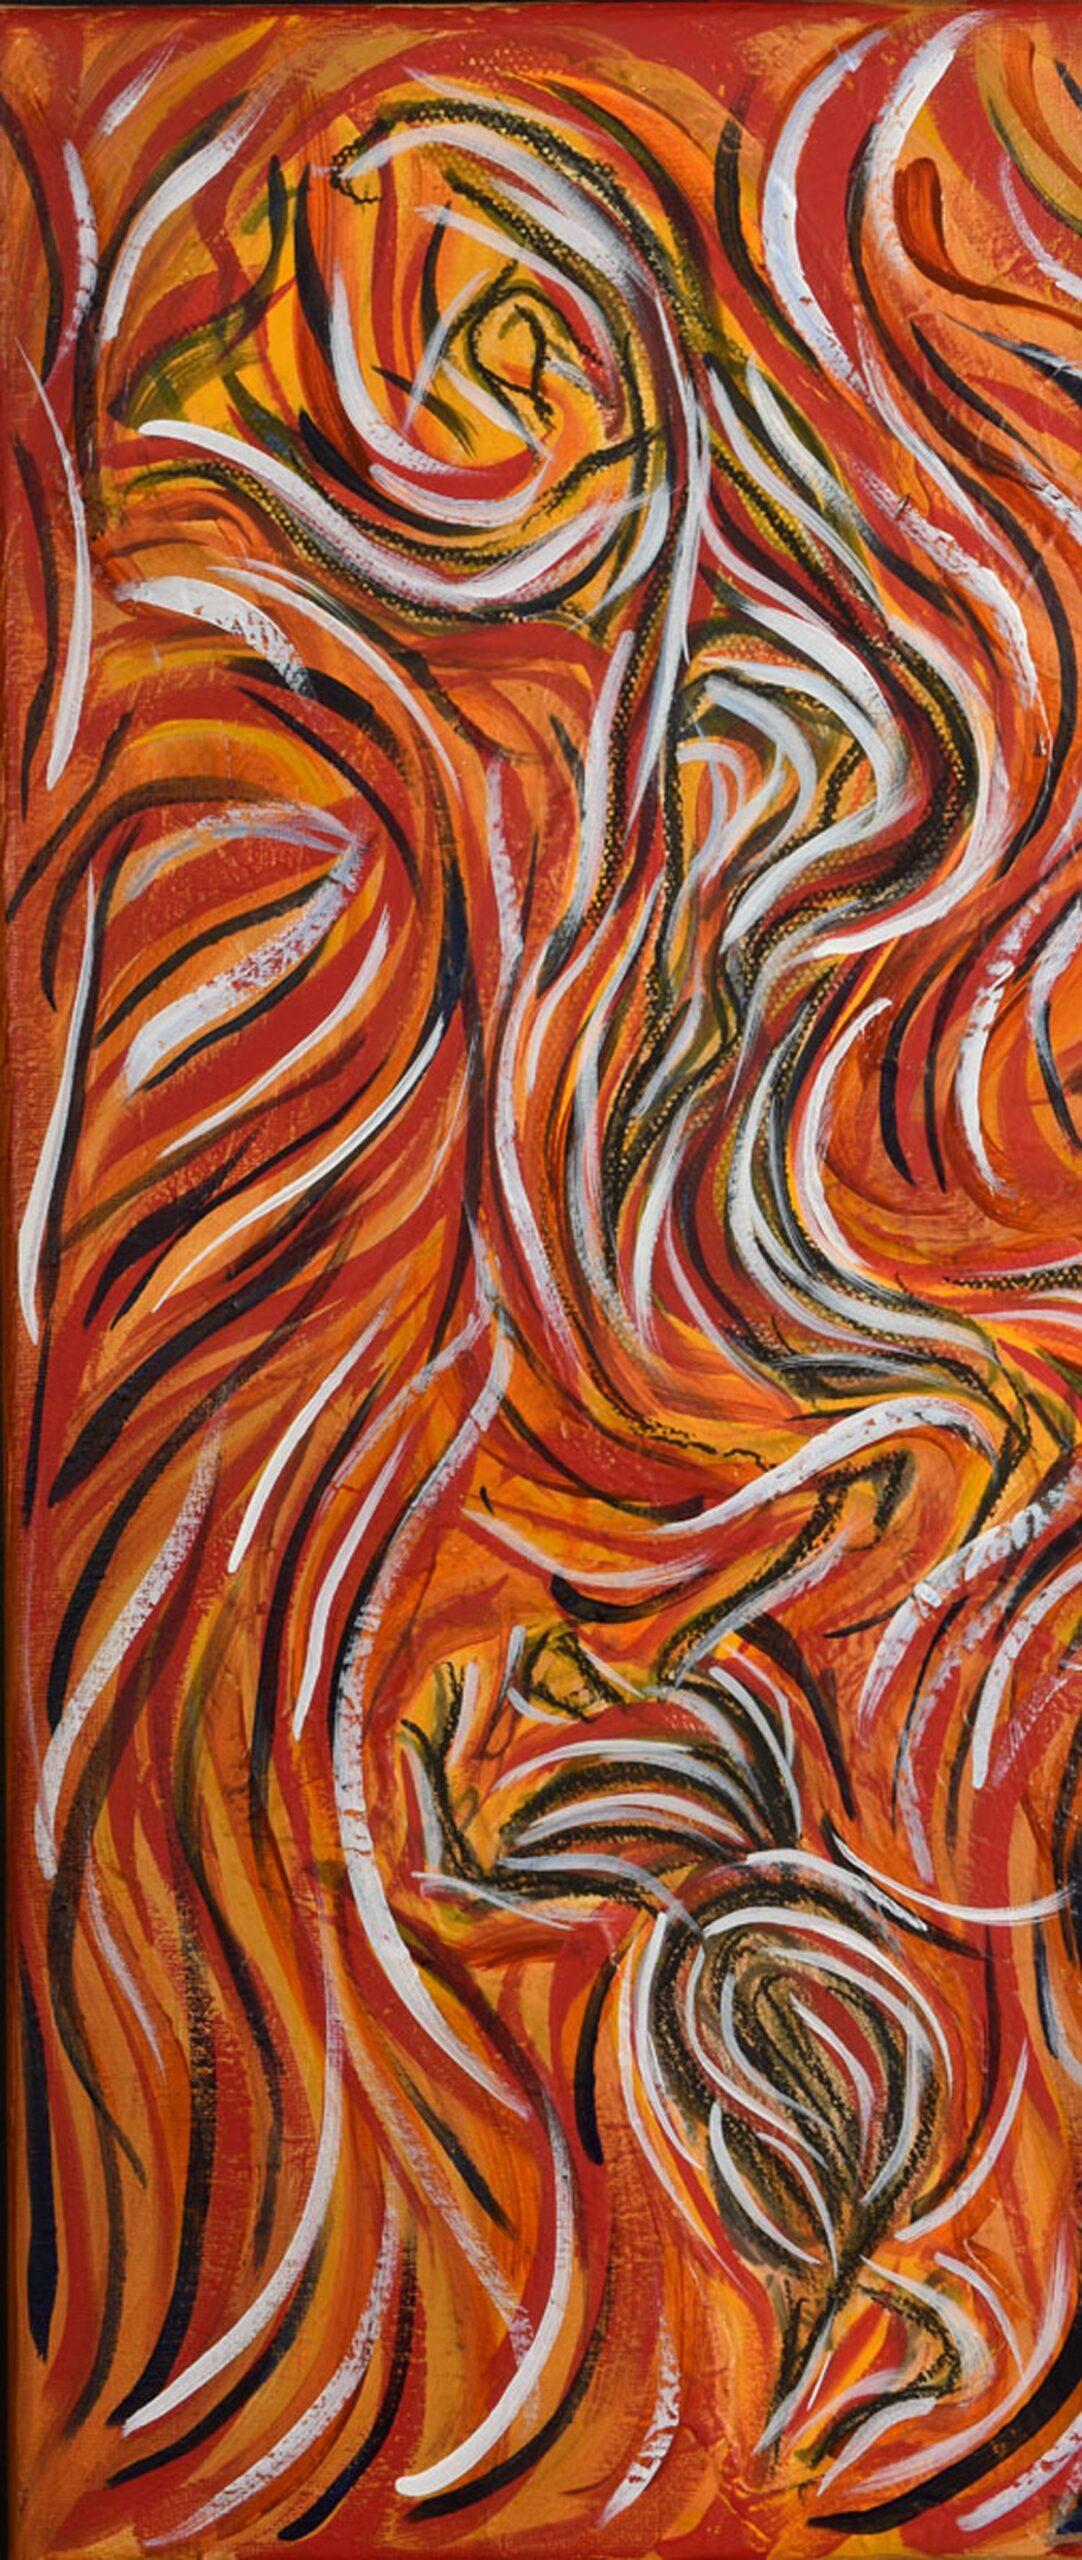 Dancers_painting_by_Vibha_Nanda-compressor